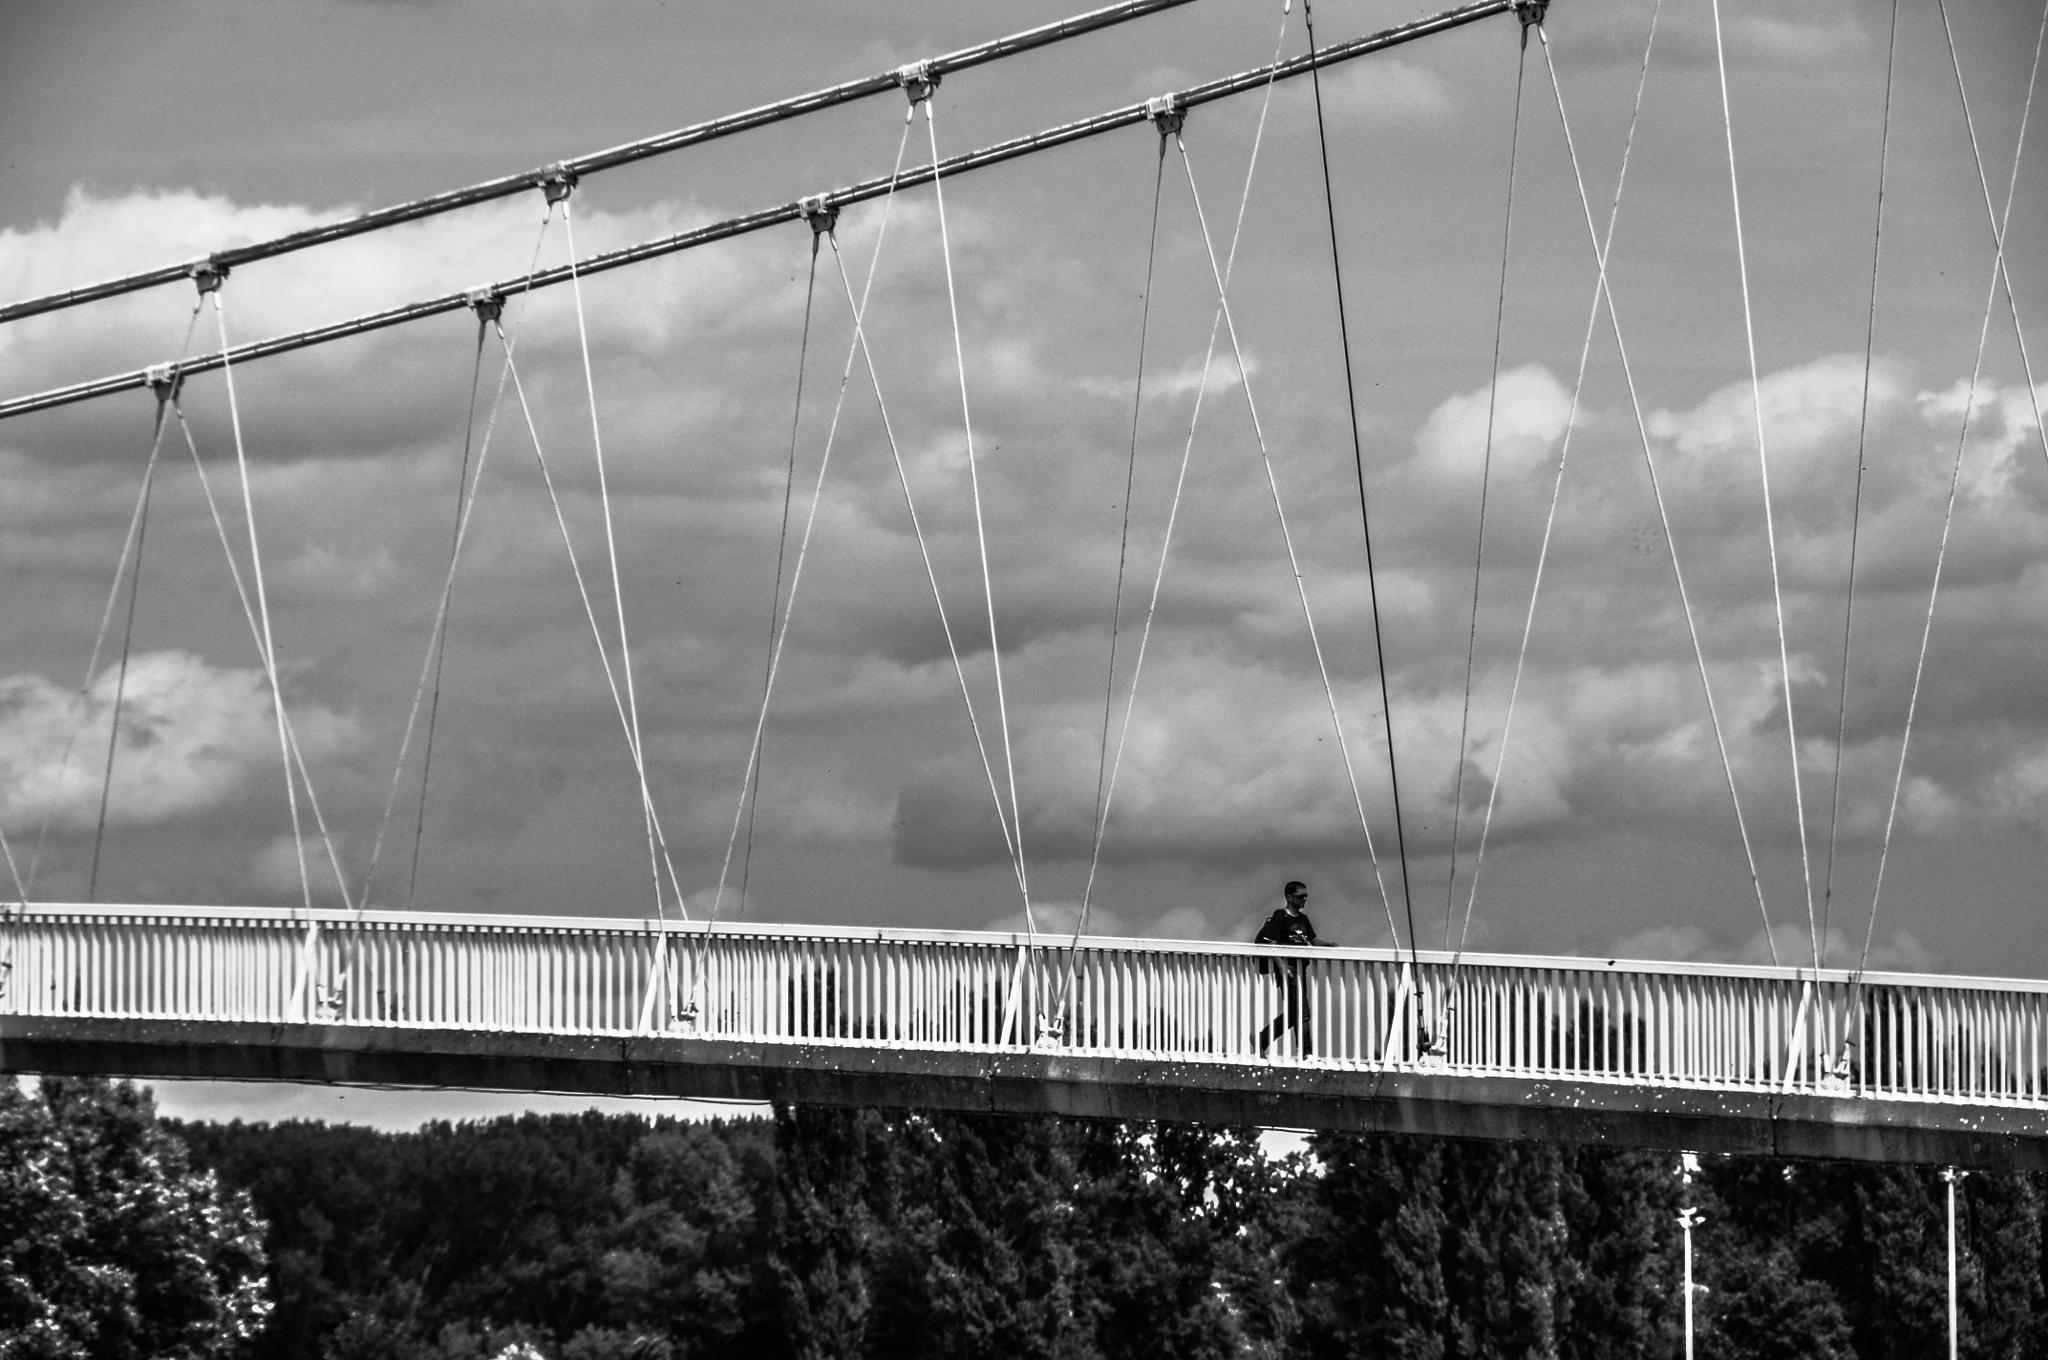 Pedestrian Bridge by tamara.seles